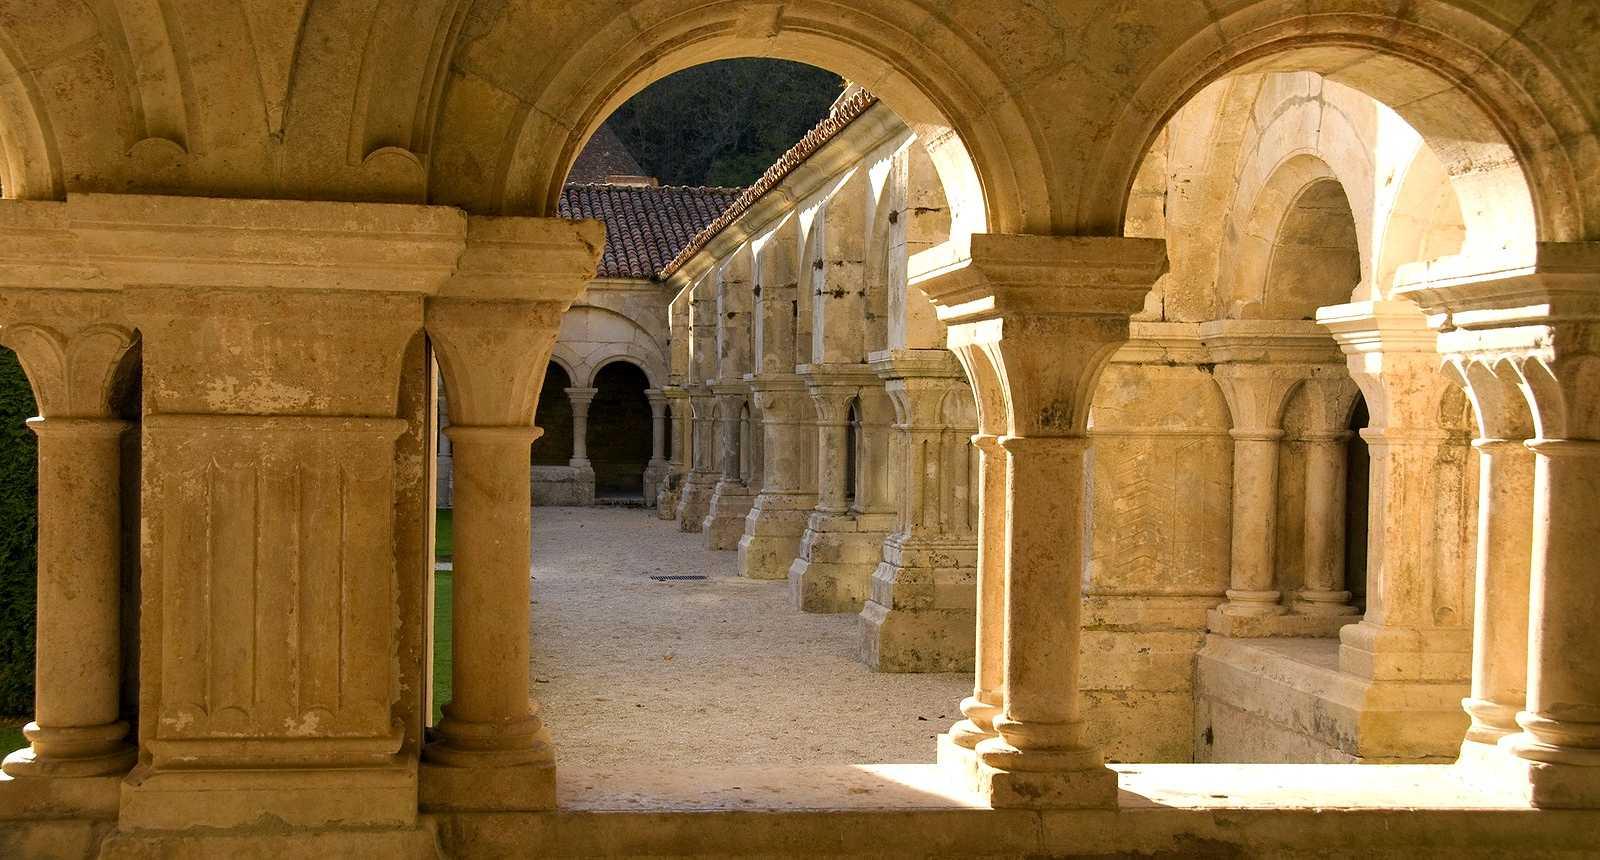 L'Abbaye de Fontenay à Marmagne